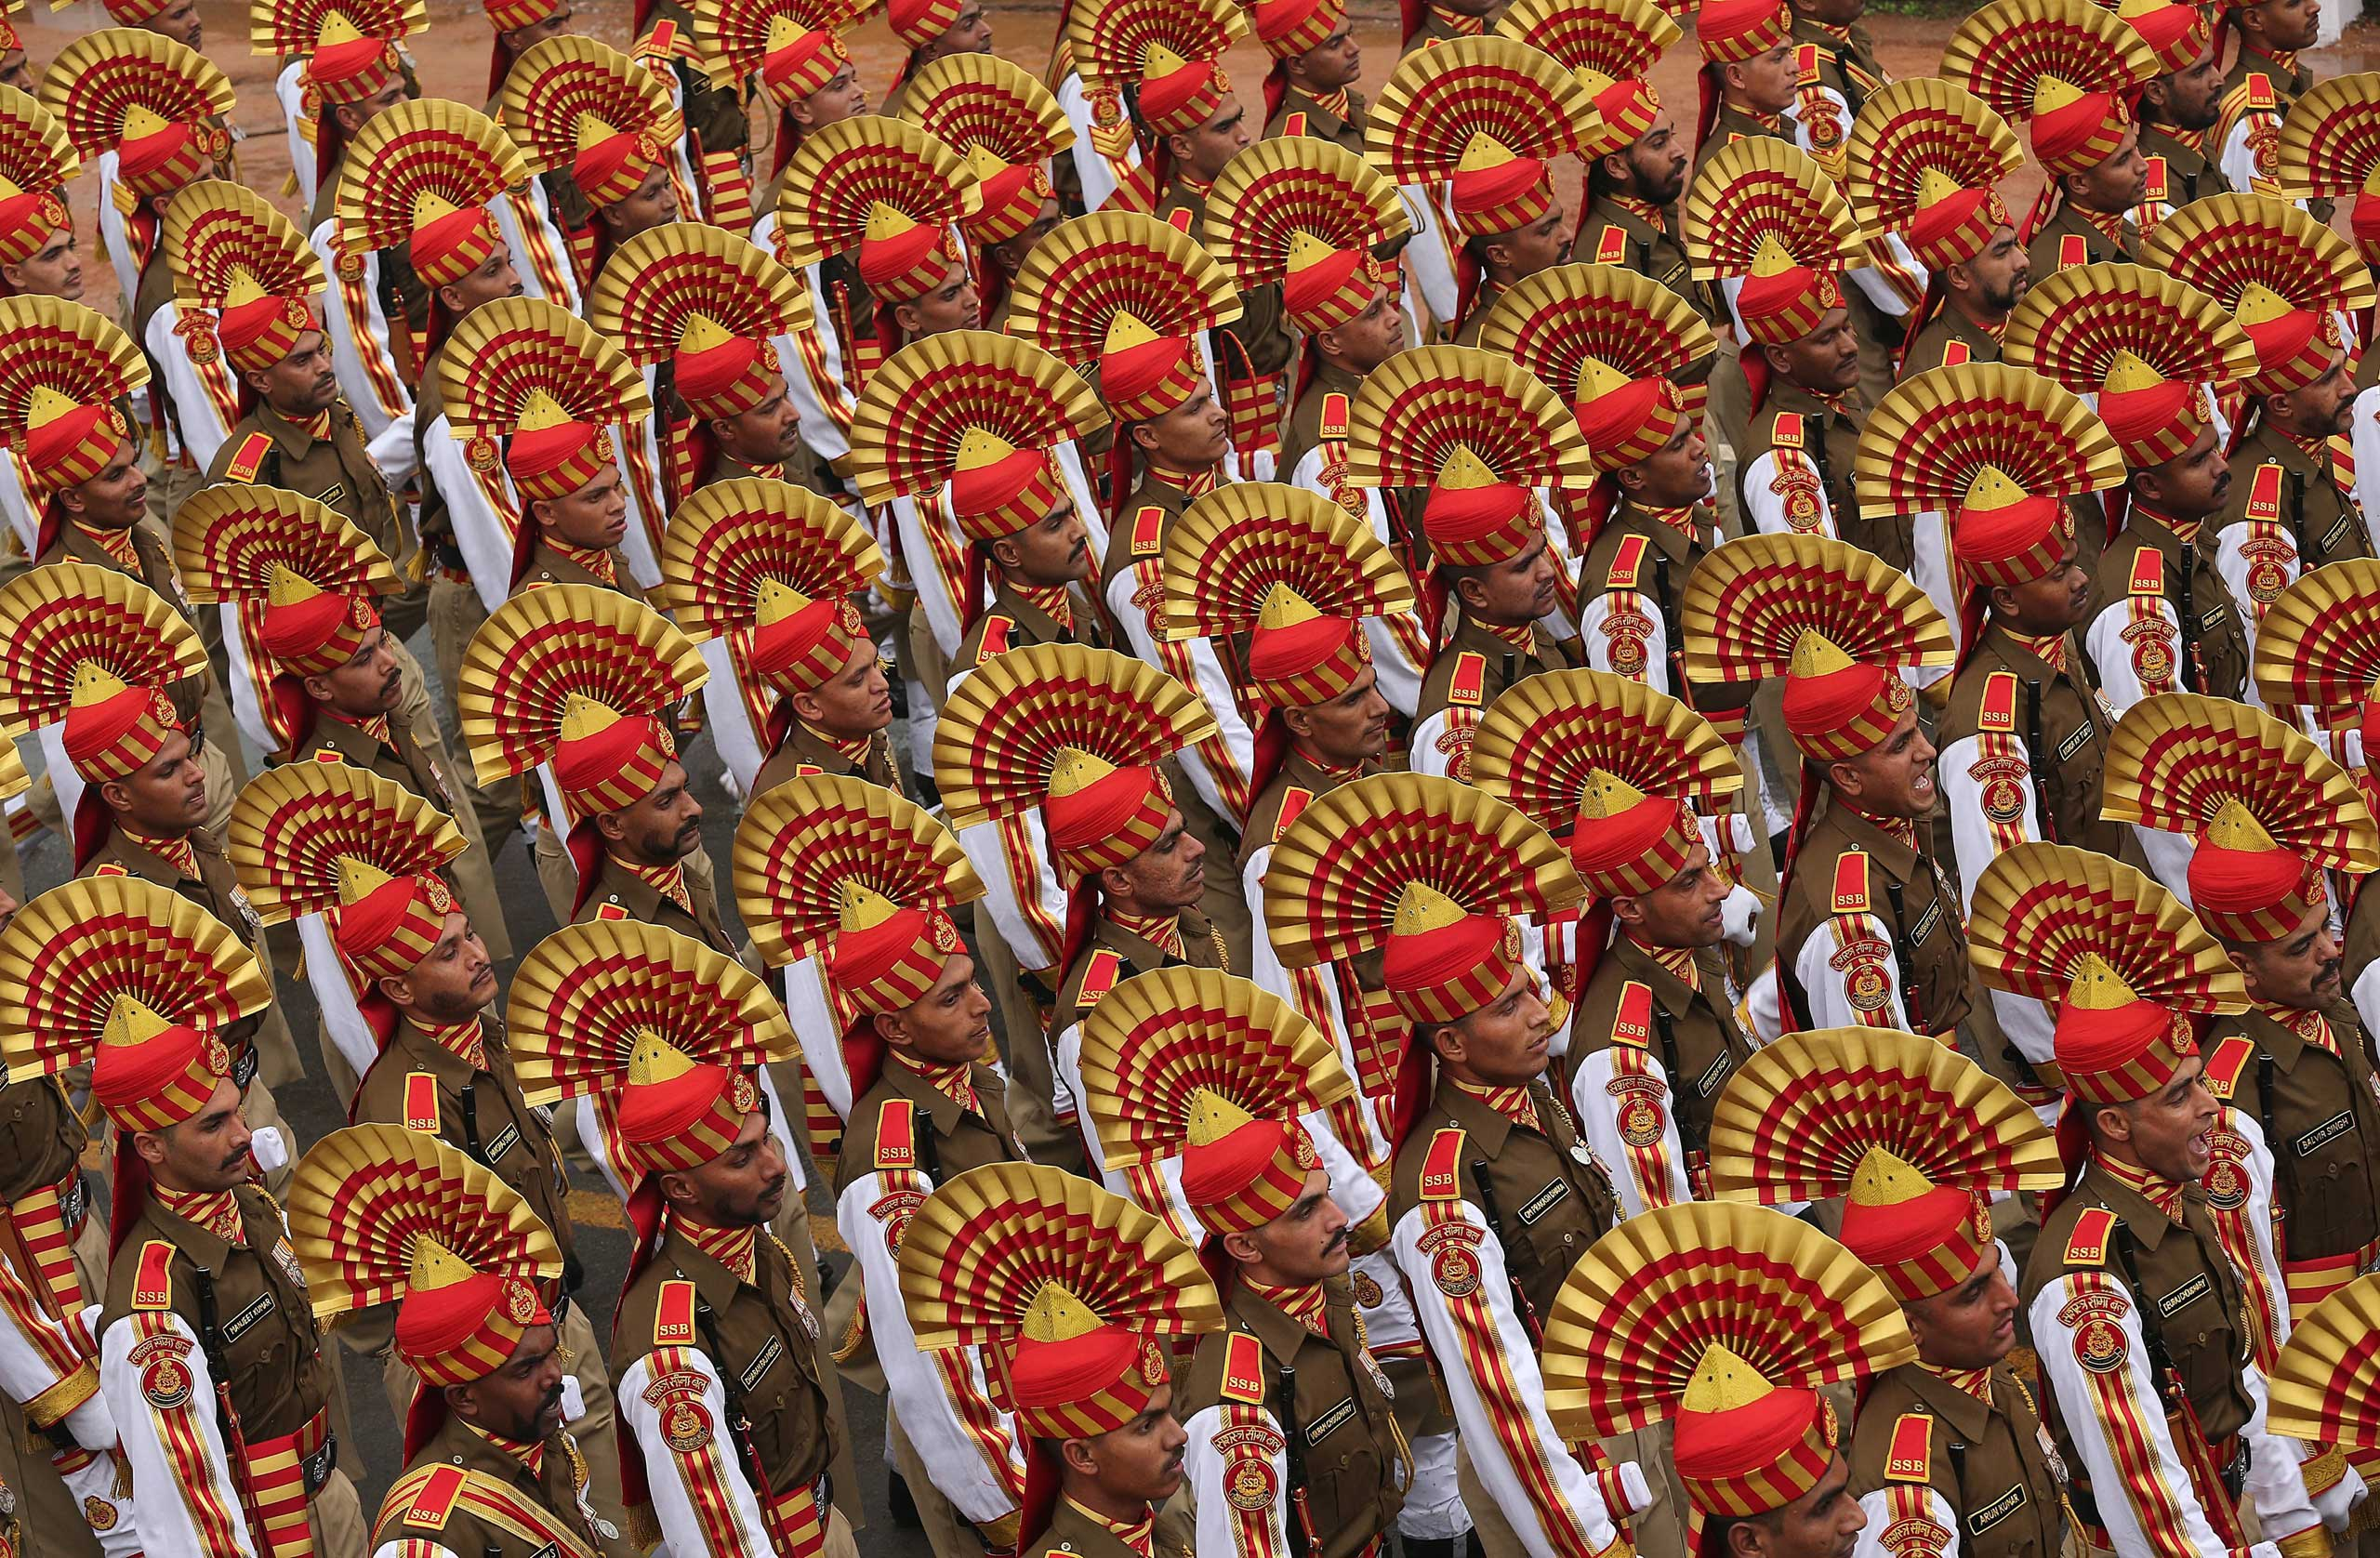 A paramilitary unit participates in the 66th Republic day function in New Delhi, Jan. 25, 2015.